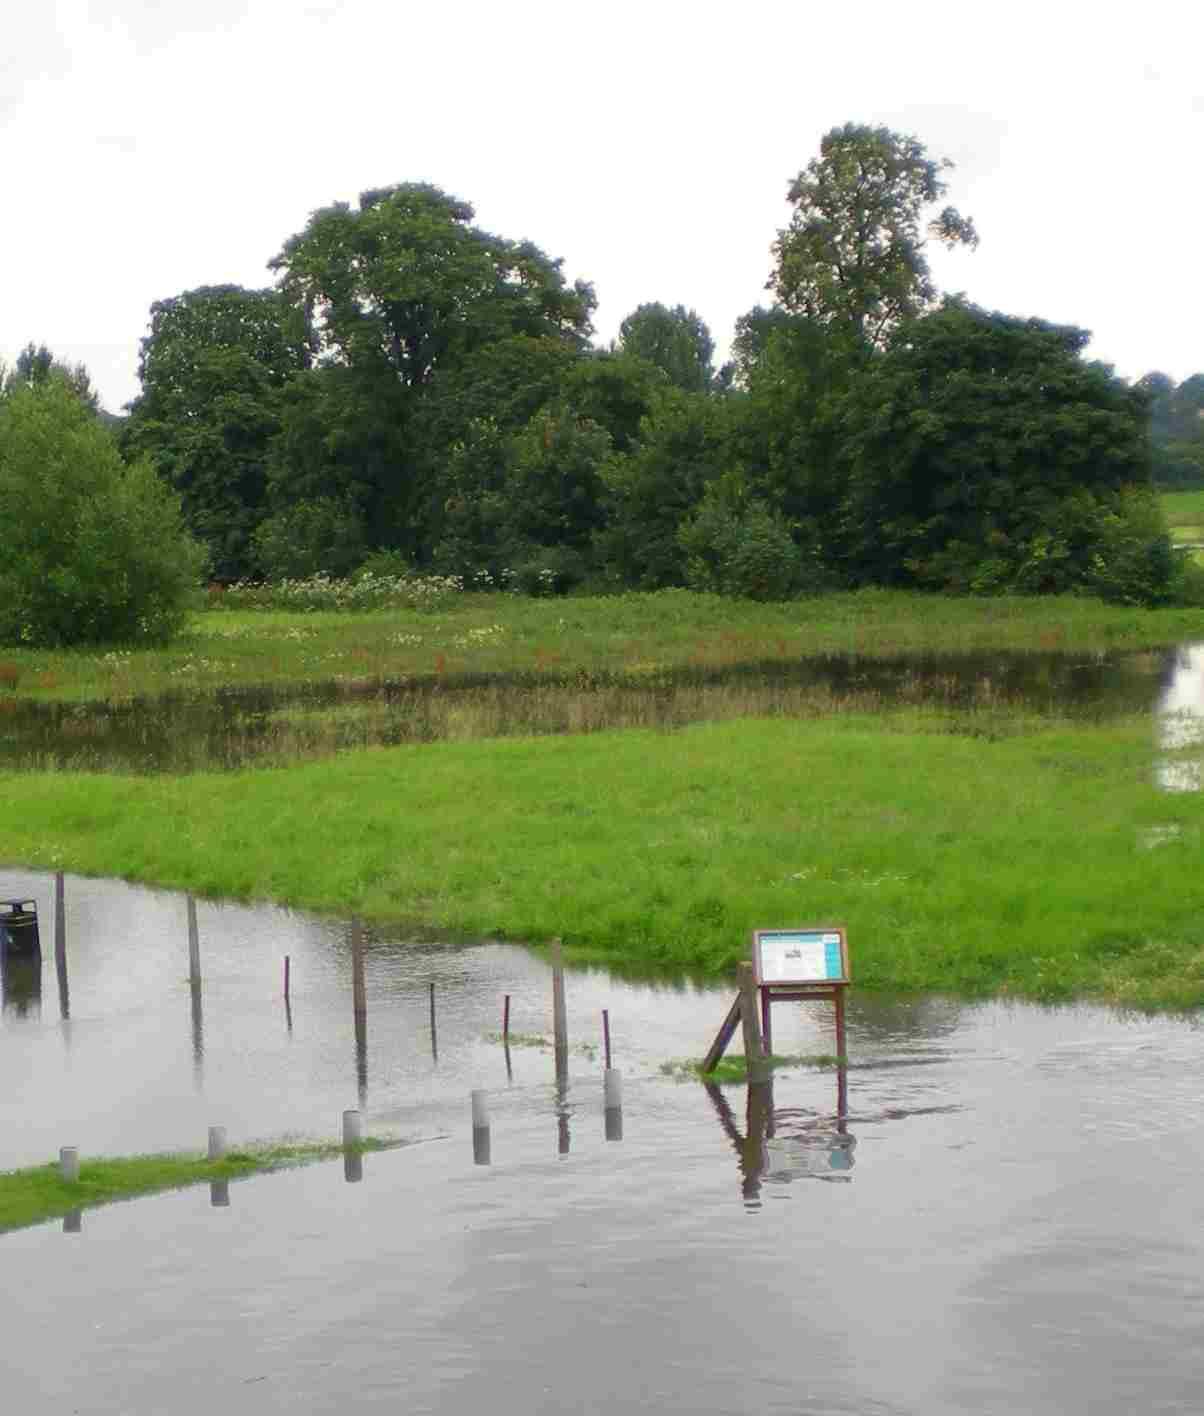 Lowland UK river